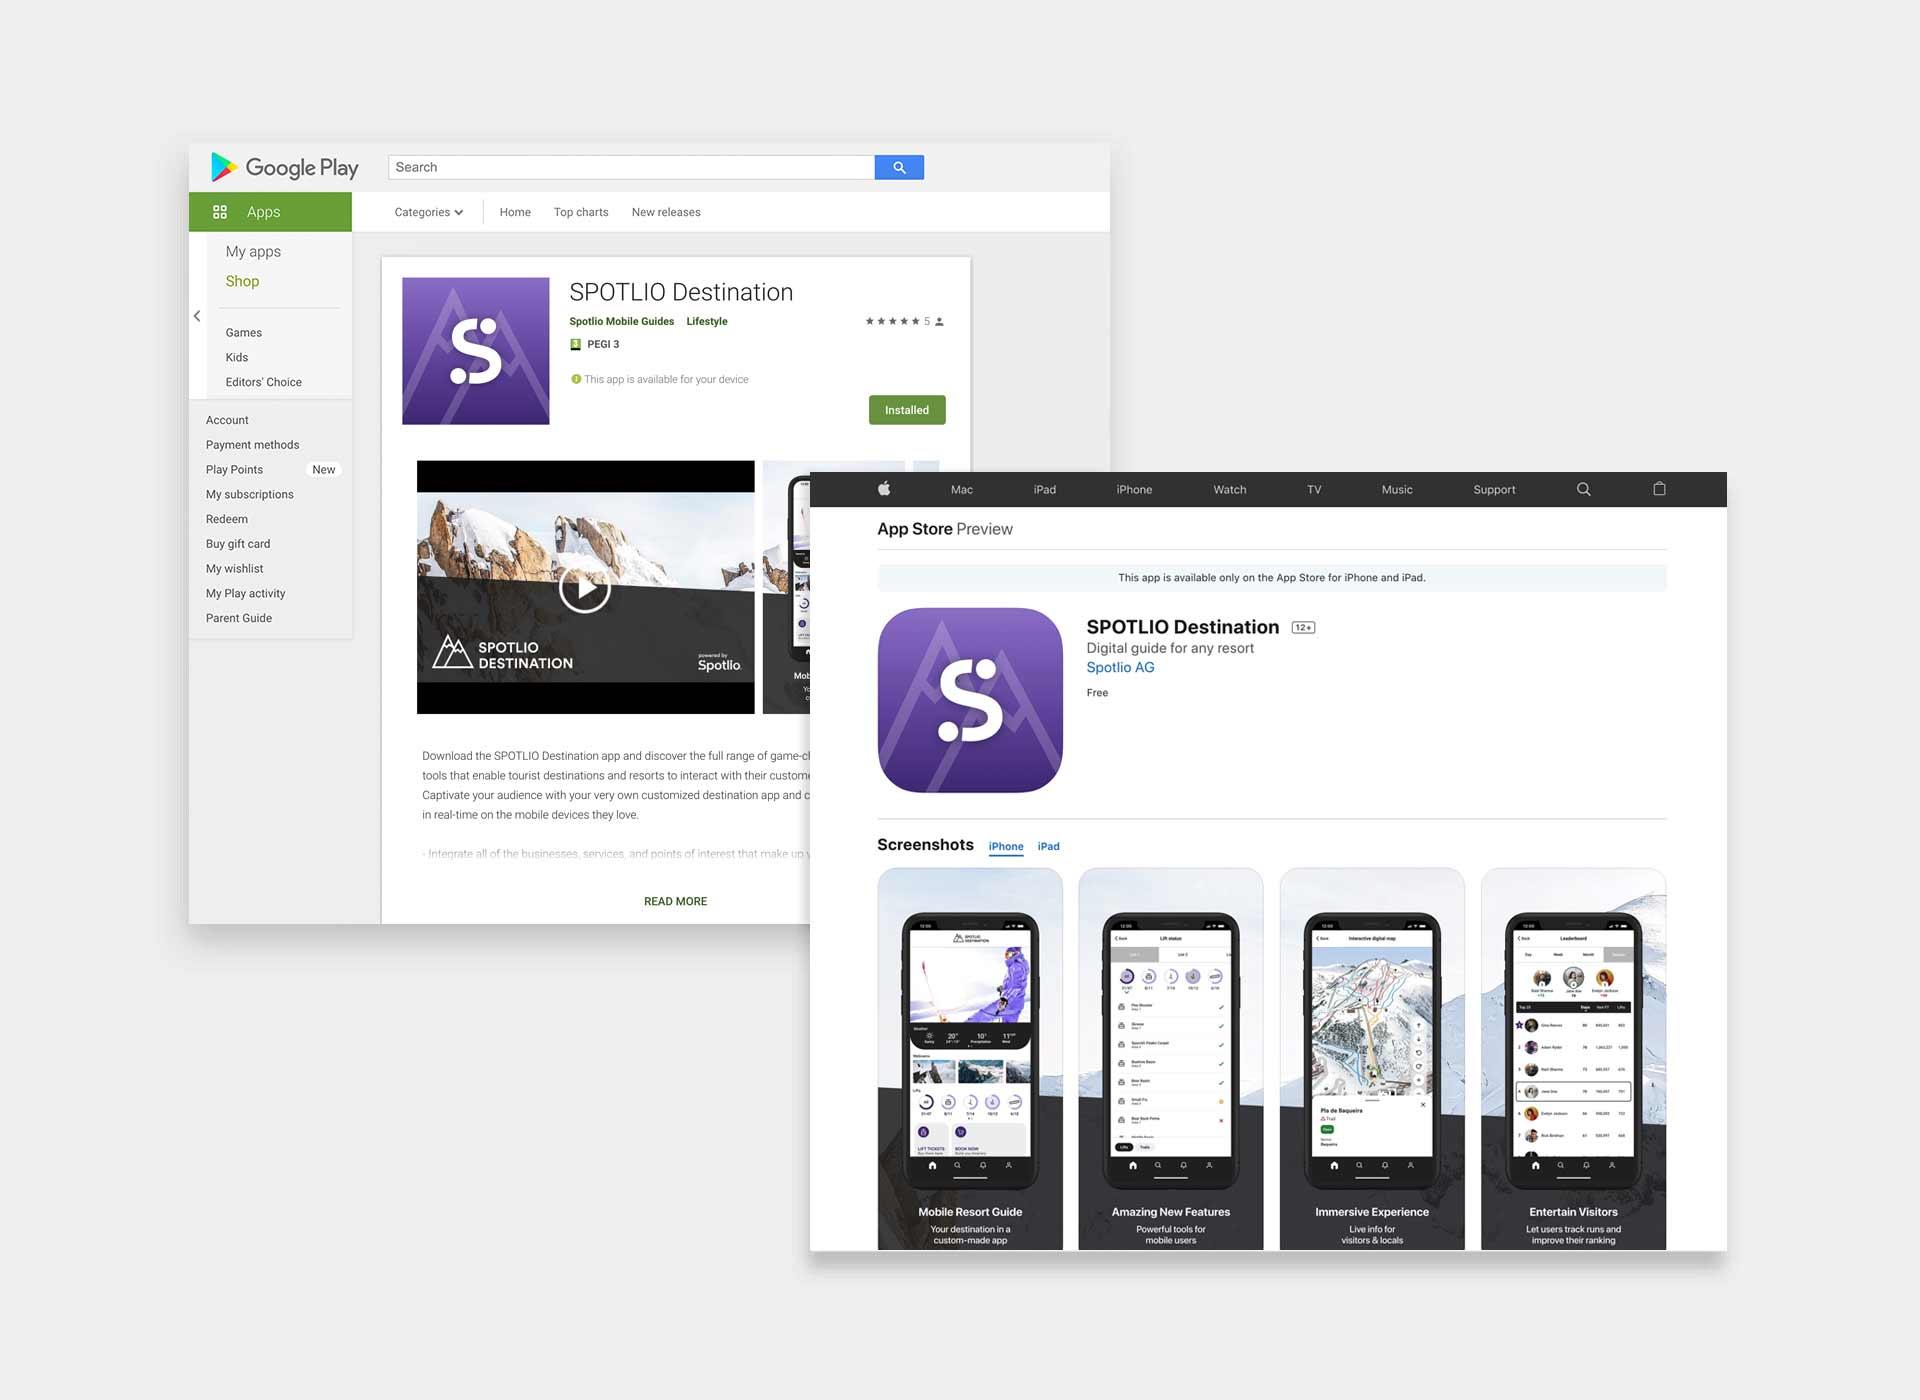 mobile-apps-application-development-company-builder-tracking-design-creator-app-10